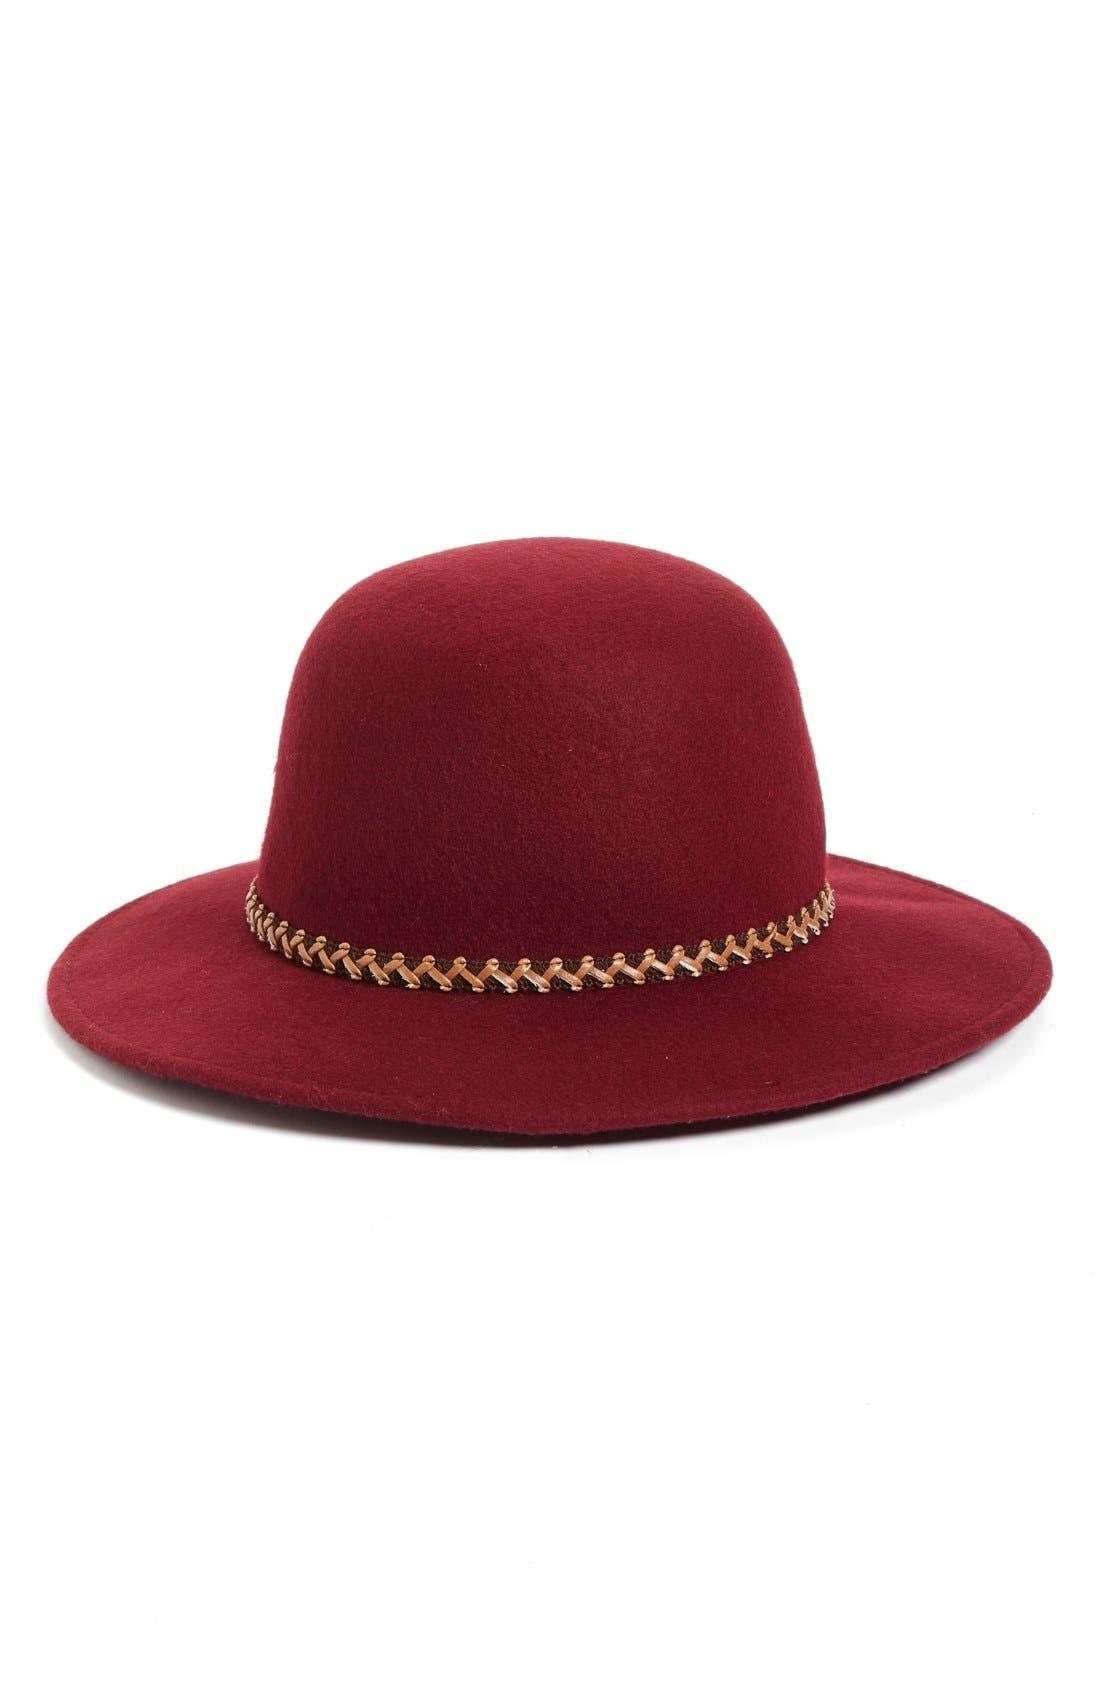 Main Image - August Hat Wool Hat